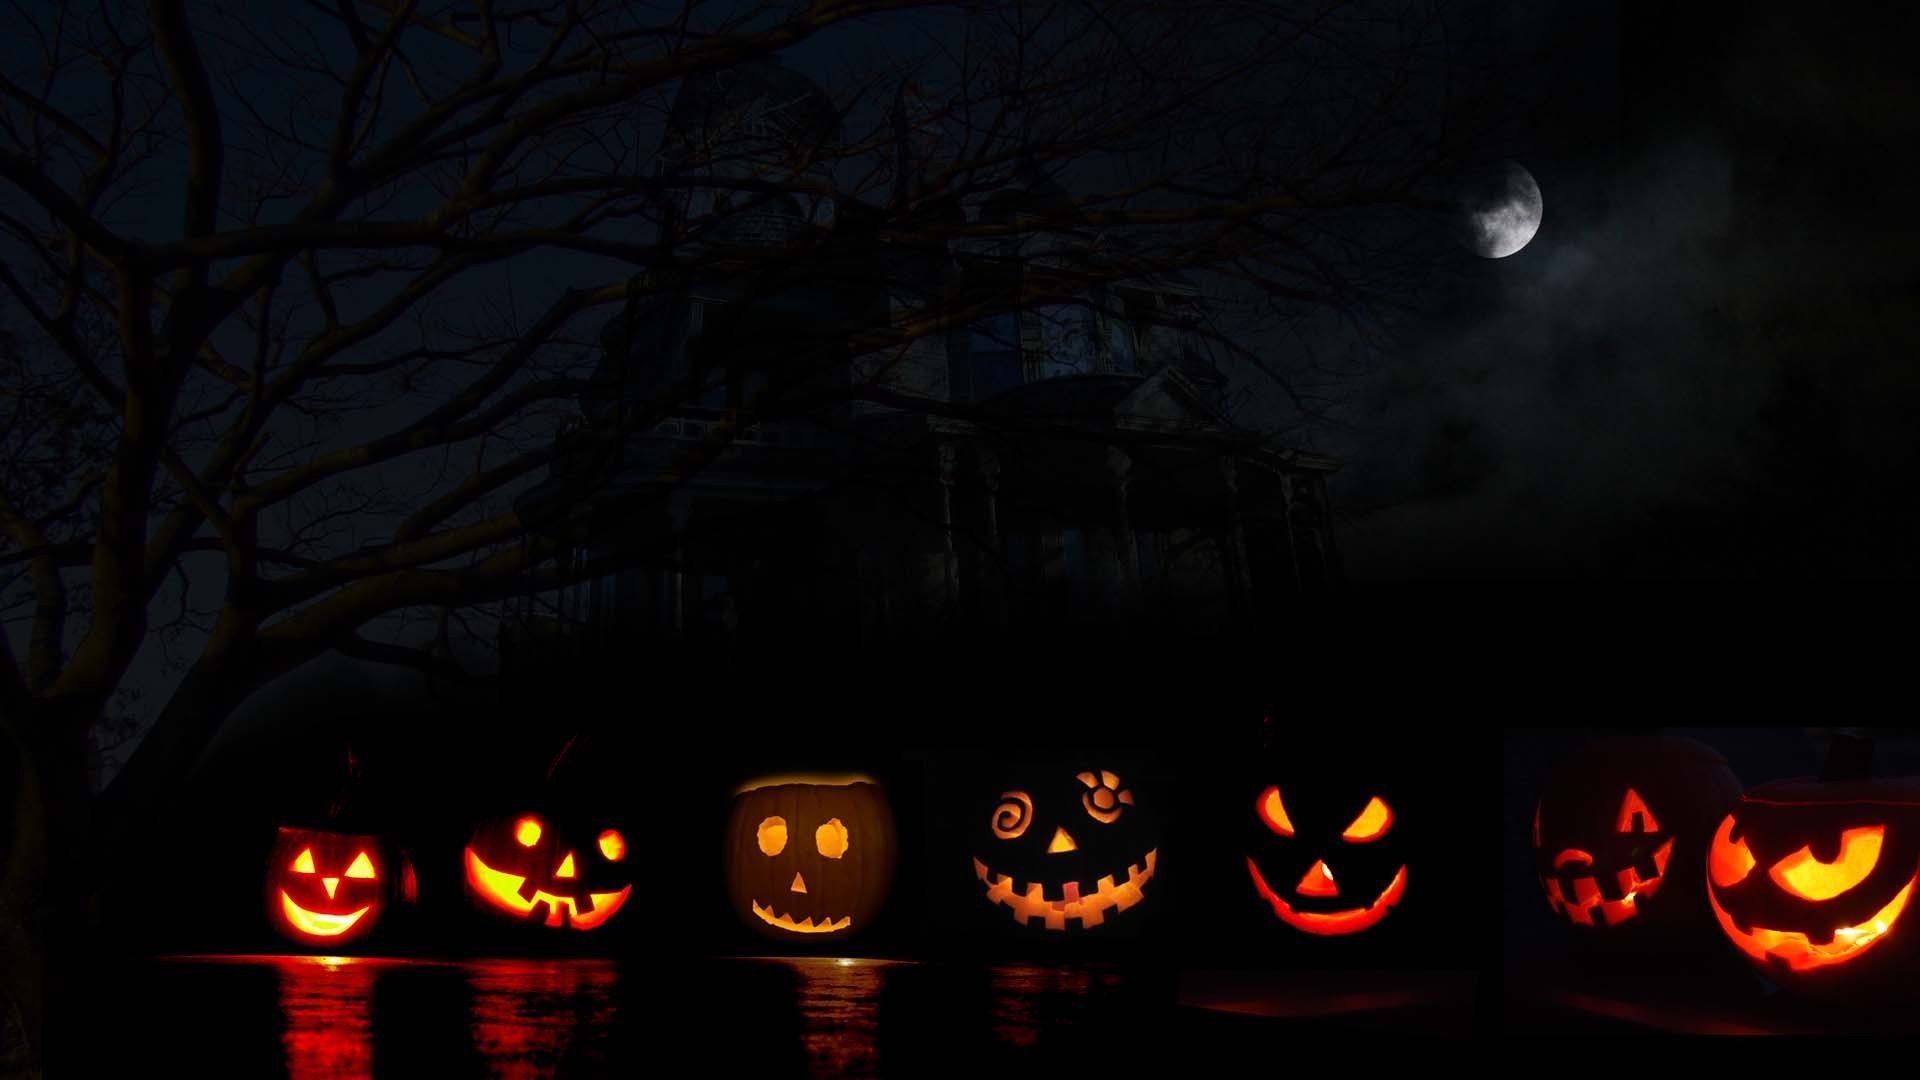 Hd Halloween Wallpapers Top Free Hd Halloween Backgrounds